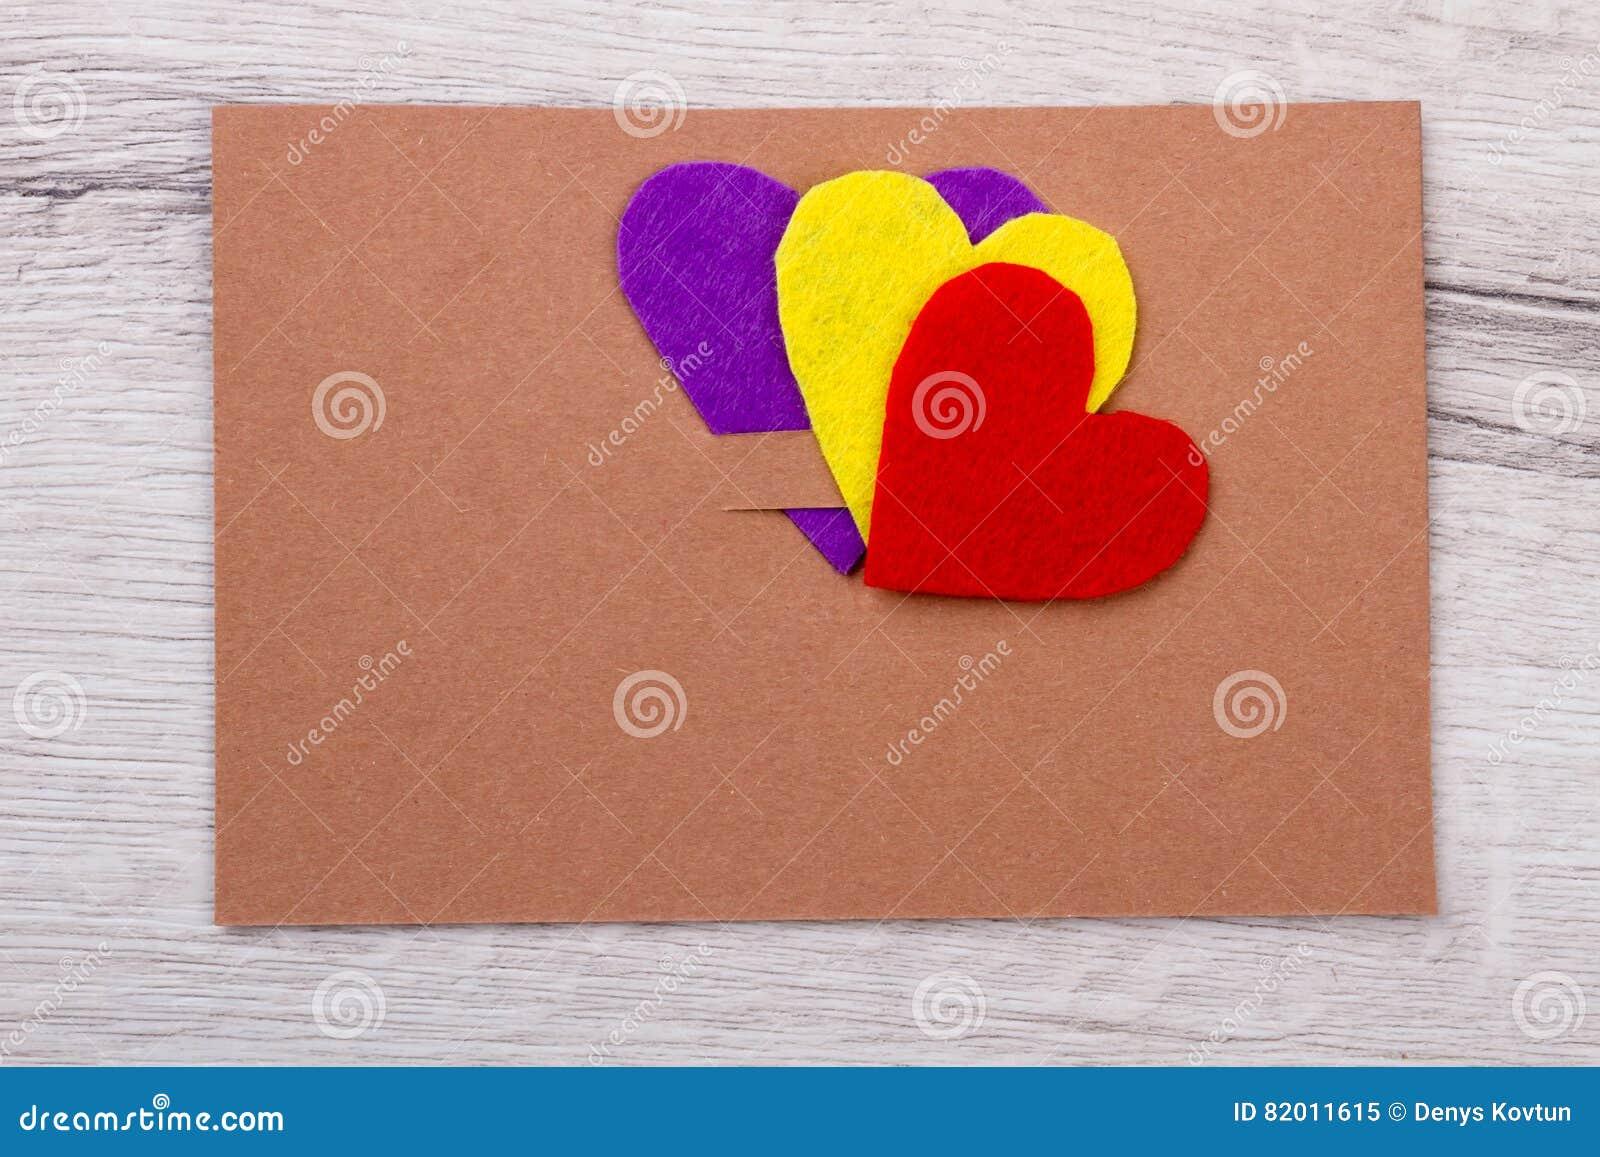 Mockup Of Greeting Card Stock Image Image Of Date Cardboard